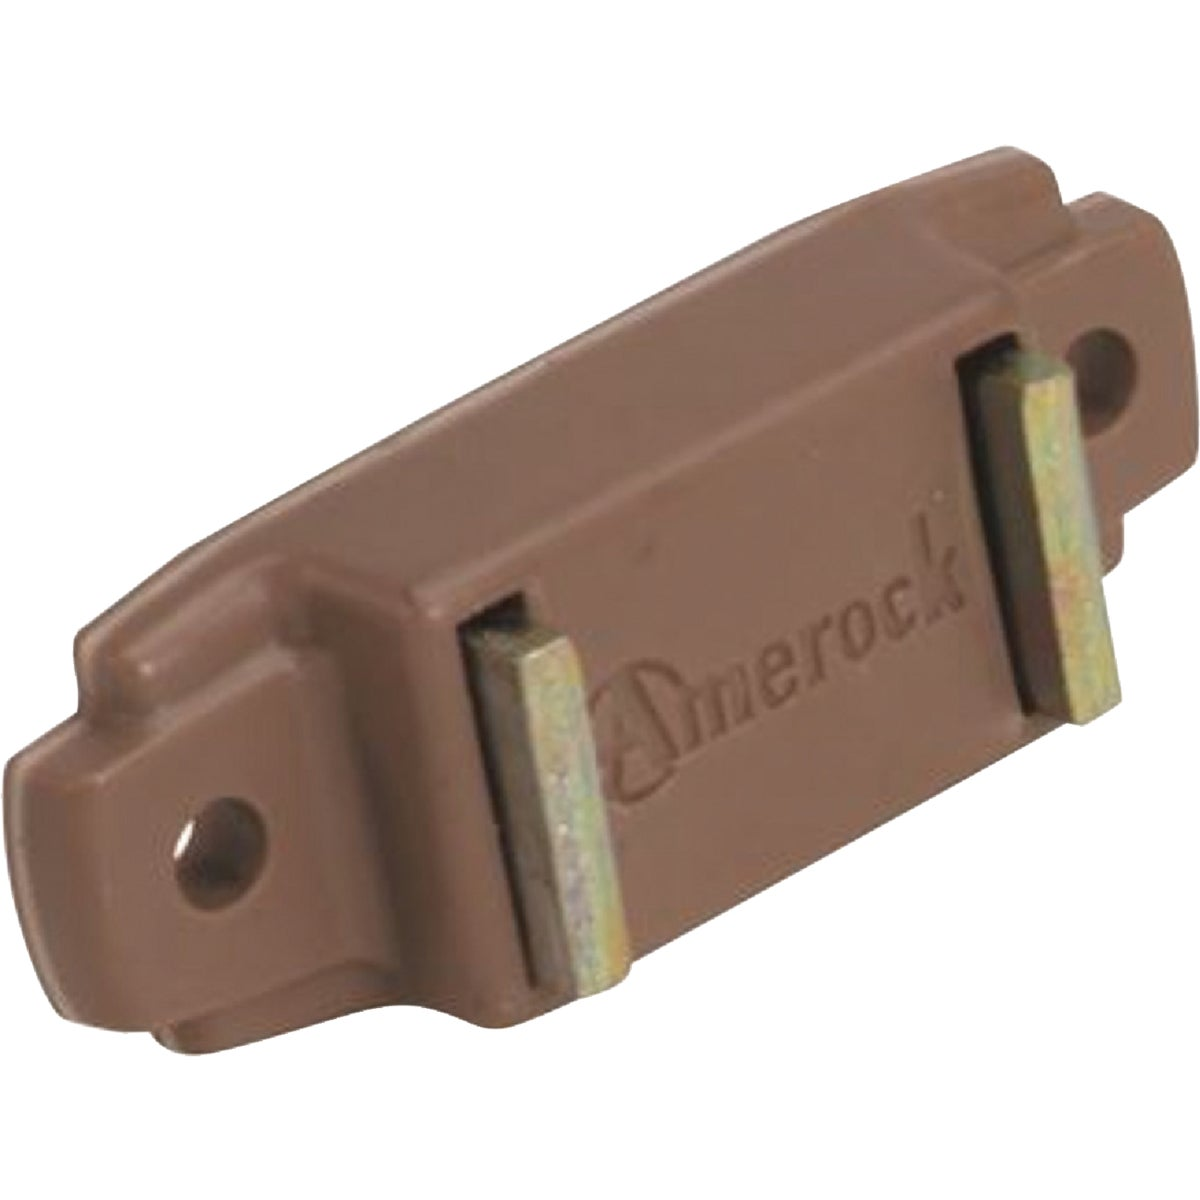 Amerock Corp. MAGNET CATCH BP9765-3PT